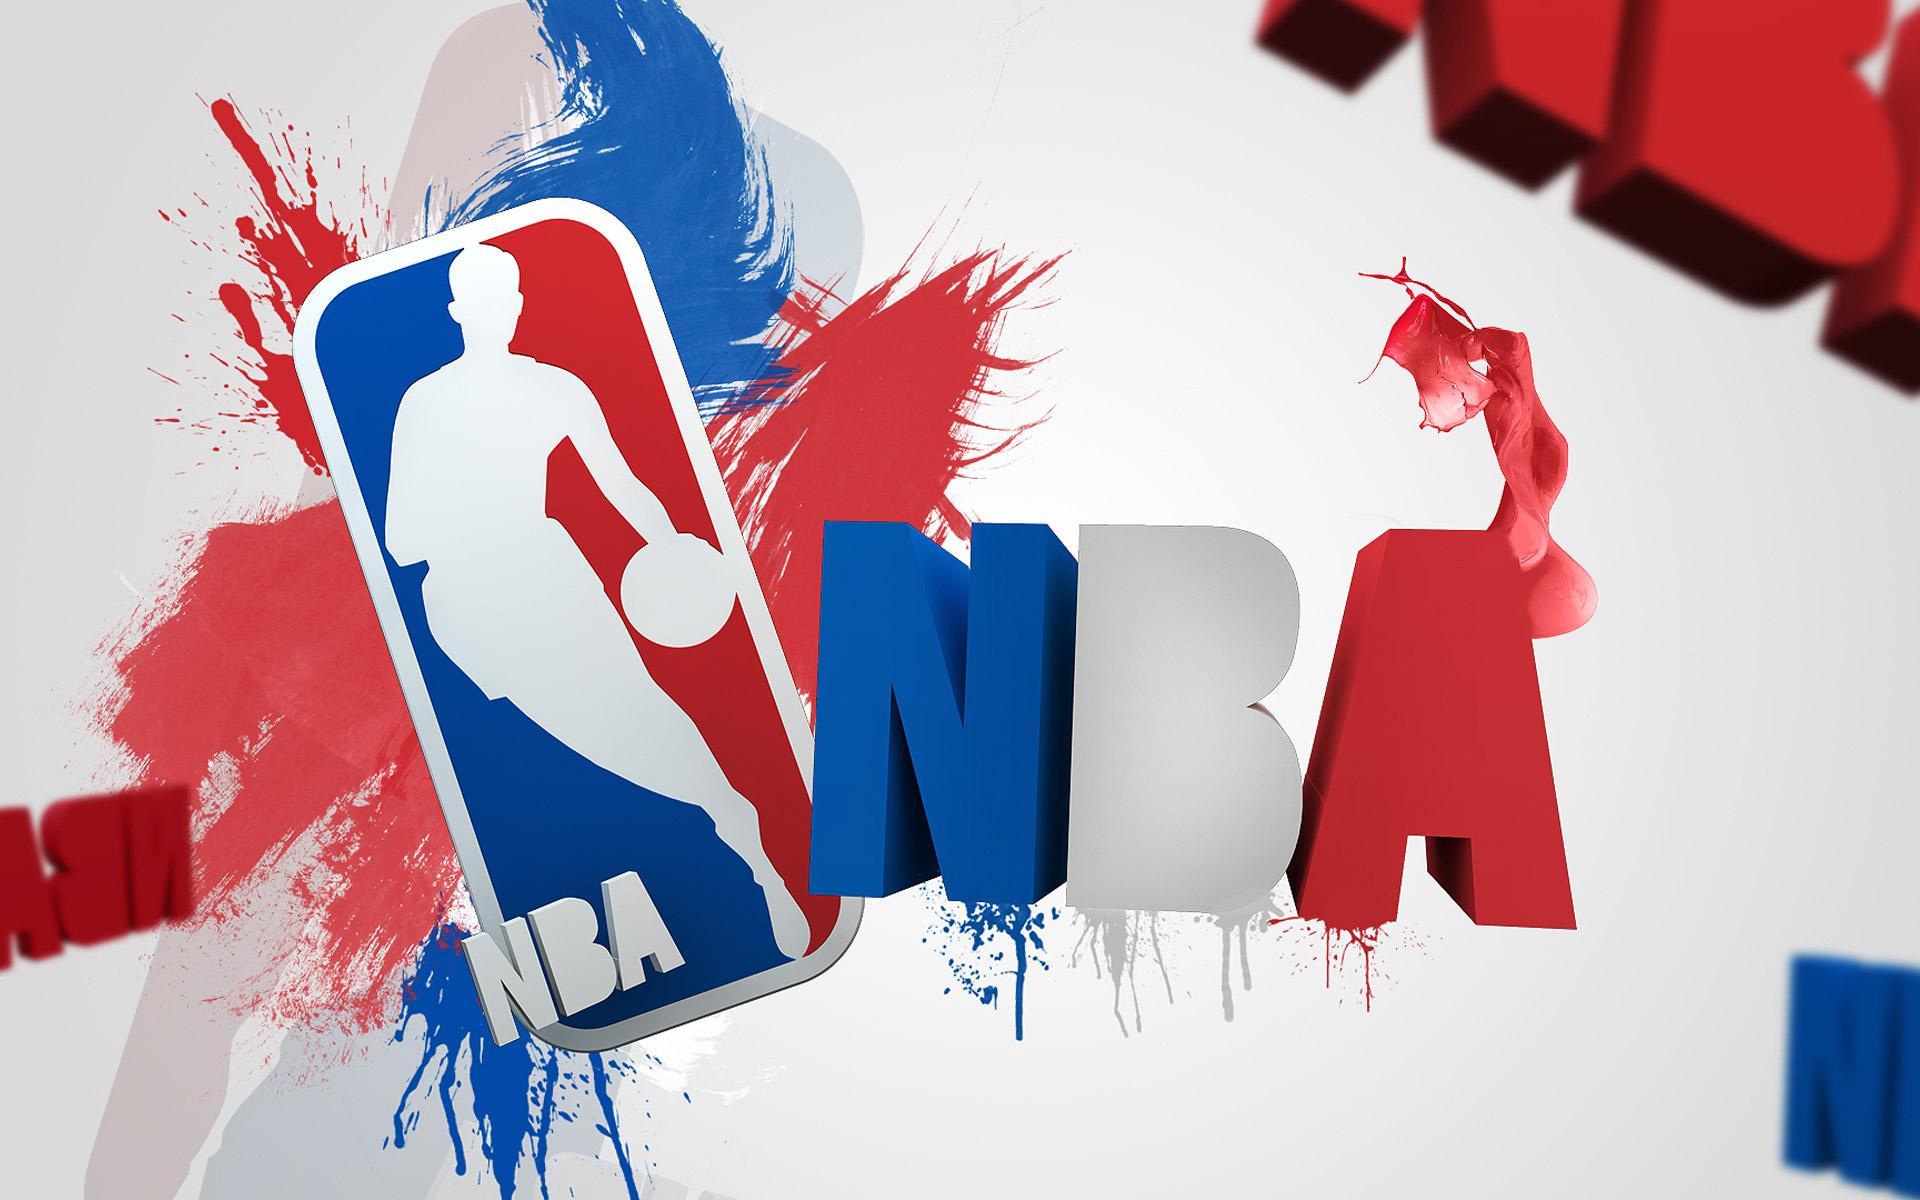 NBA Season 2013 Logo USA Basketball Sport Fan 1920x1200 WIDE Wallpaper 1920x1200